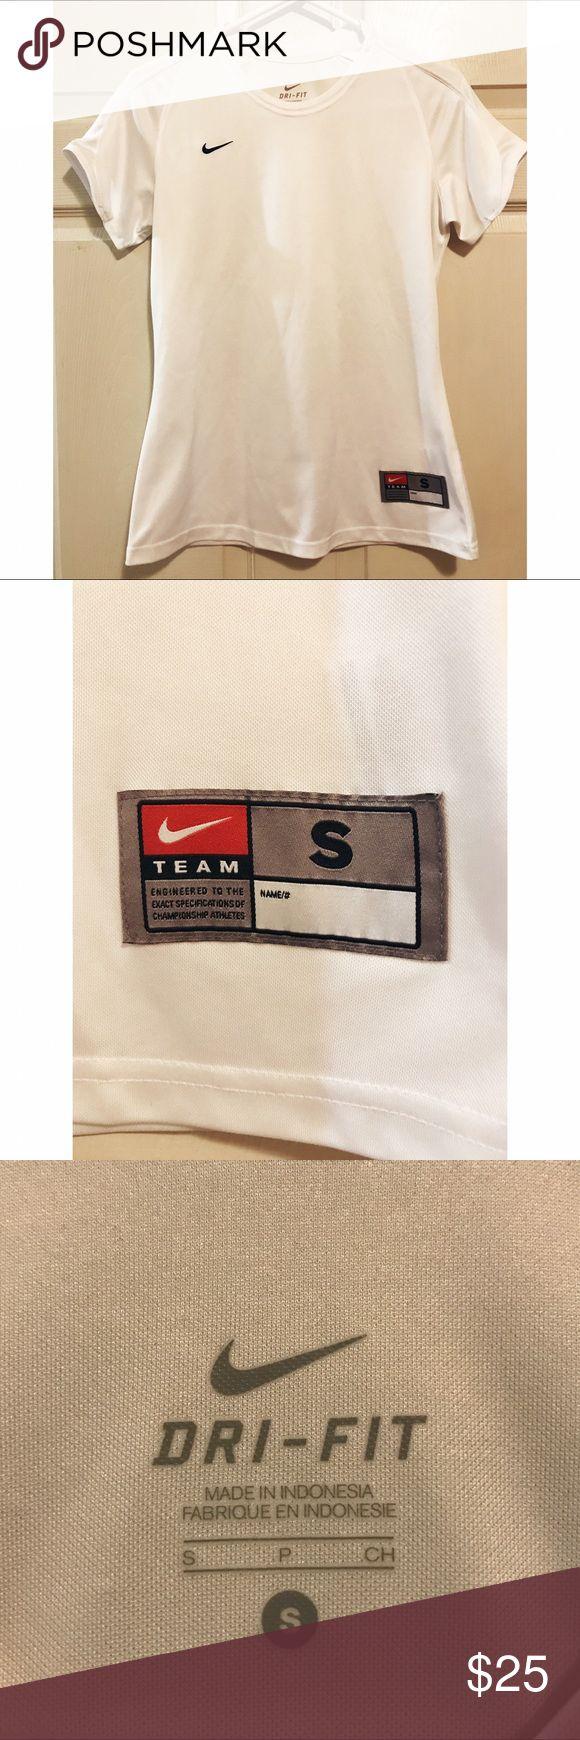 Nike • Dri Fit Short Sleeve Top Nike • White Short Sleeve Top. Dri Fit. Size small. Embroidered Nike swoosh on right side. Nike Tops Tees - Short Sleeve